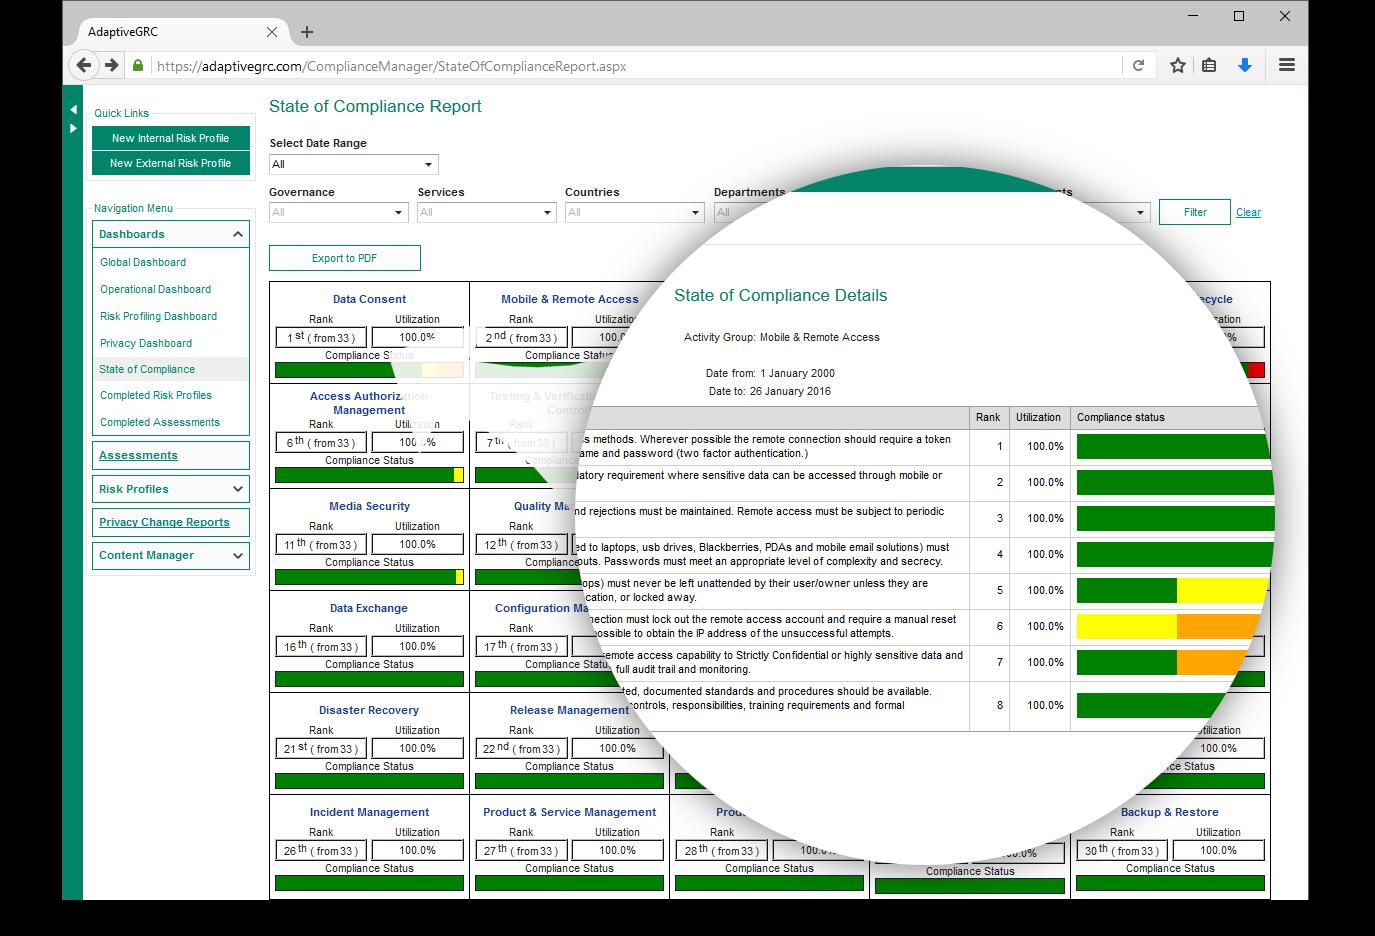 AdaptiveGRC Software - State of Compliance Report